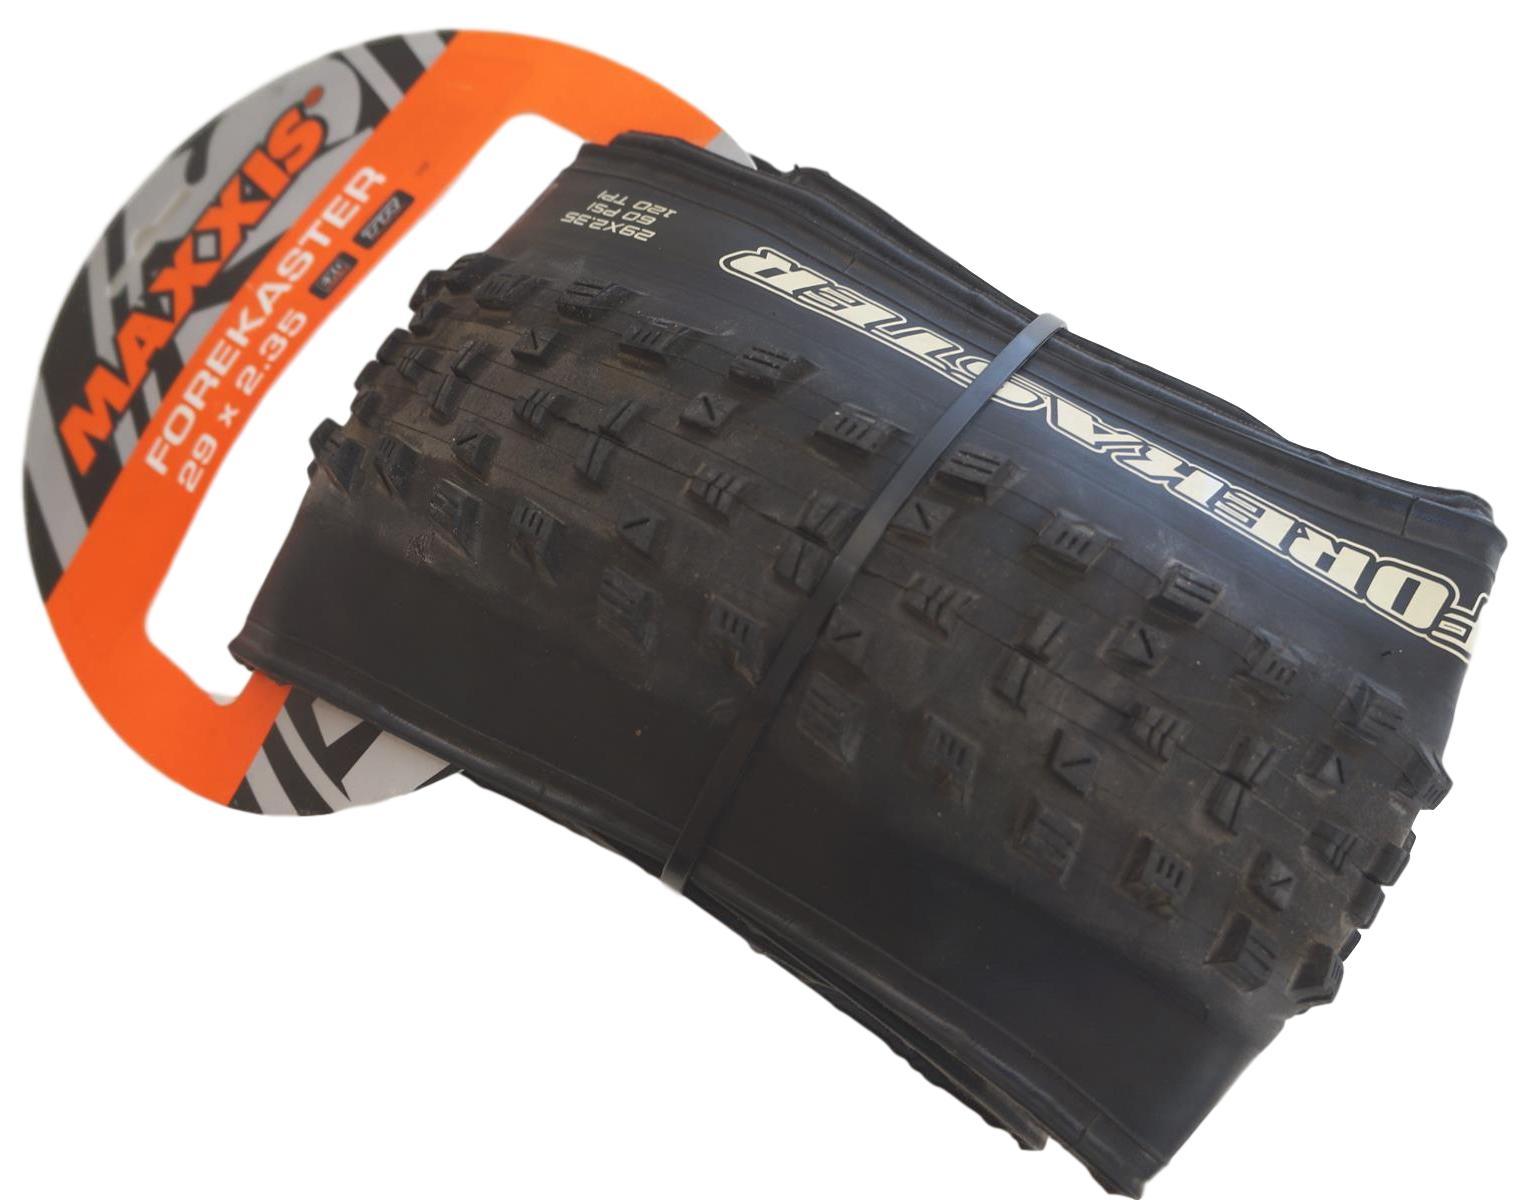 Pneu Enduro Maxxis Forekaster 29 2.35 EXO Tubeless Ready Kevlar 29er